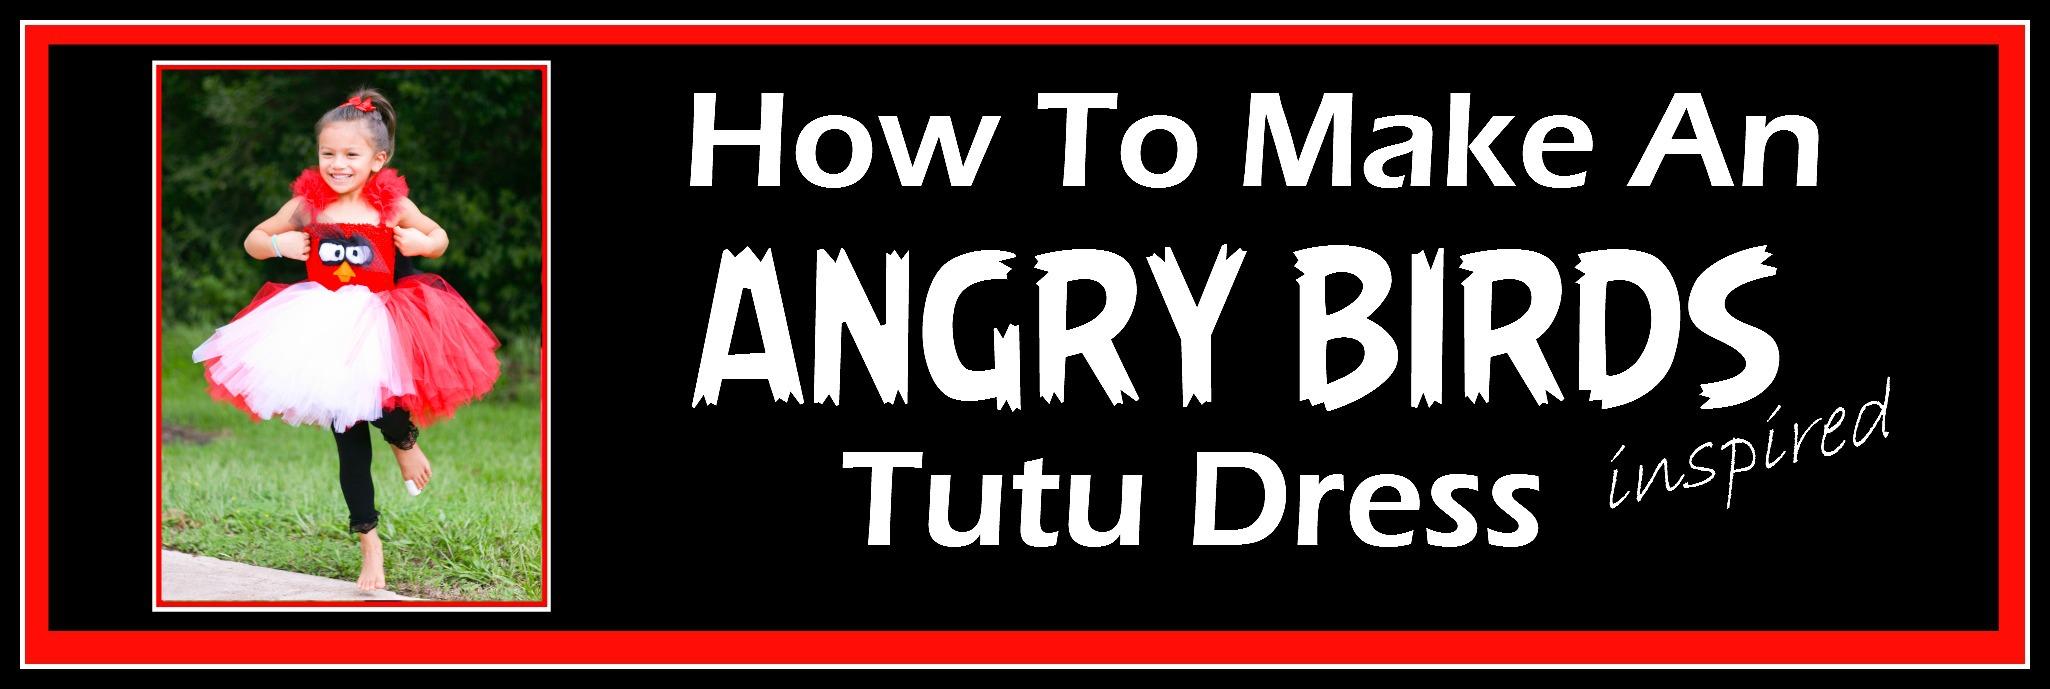 Red angry bird tutu dress tutorial | how to make a fluffy short.